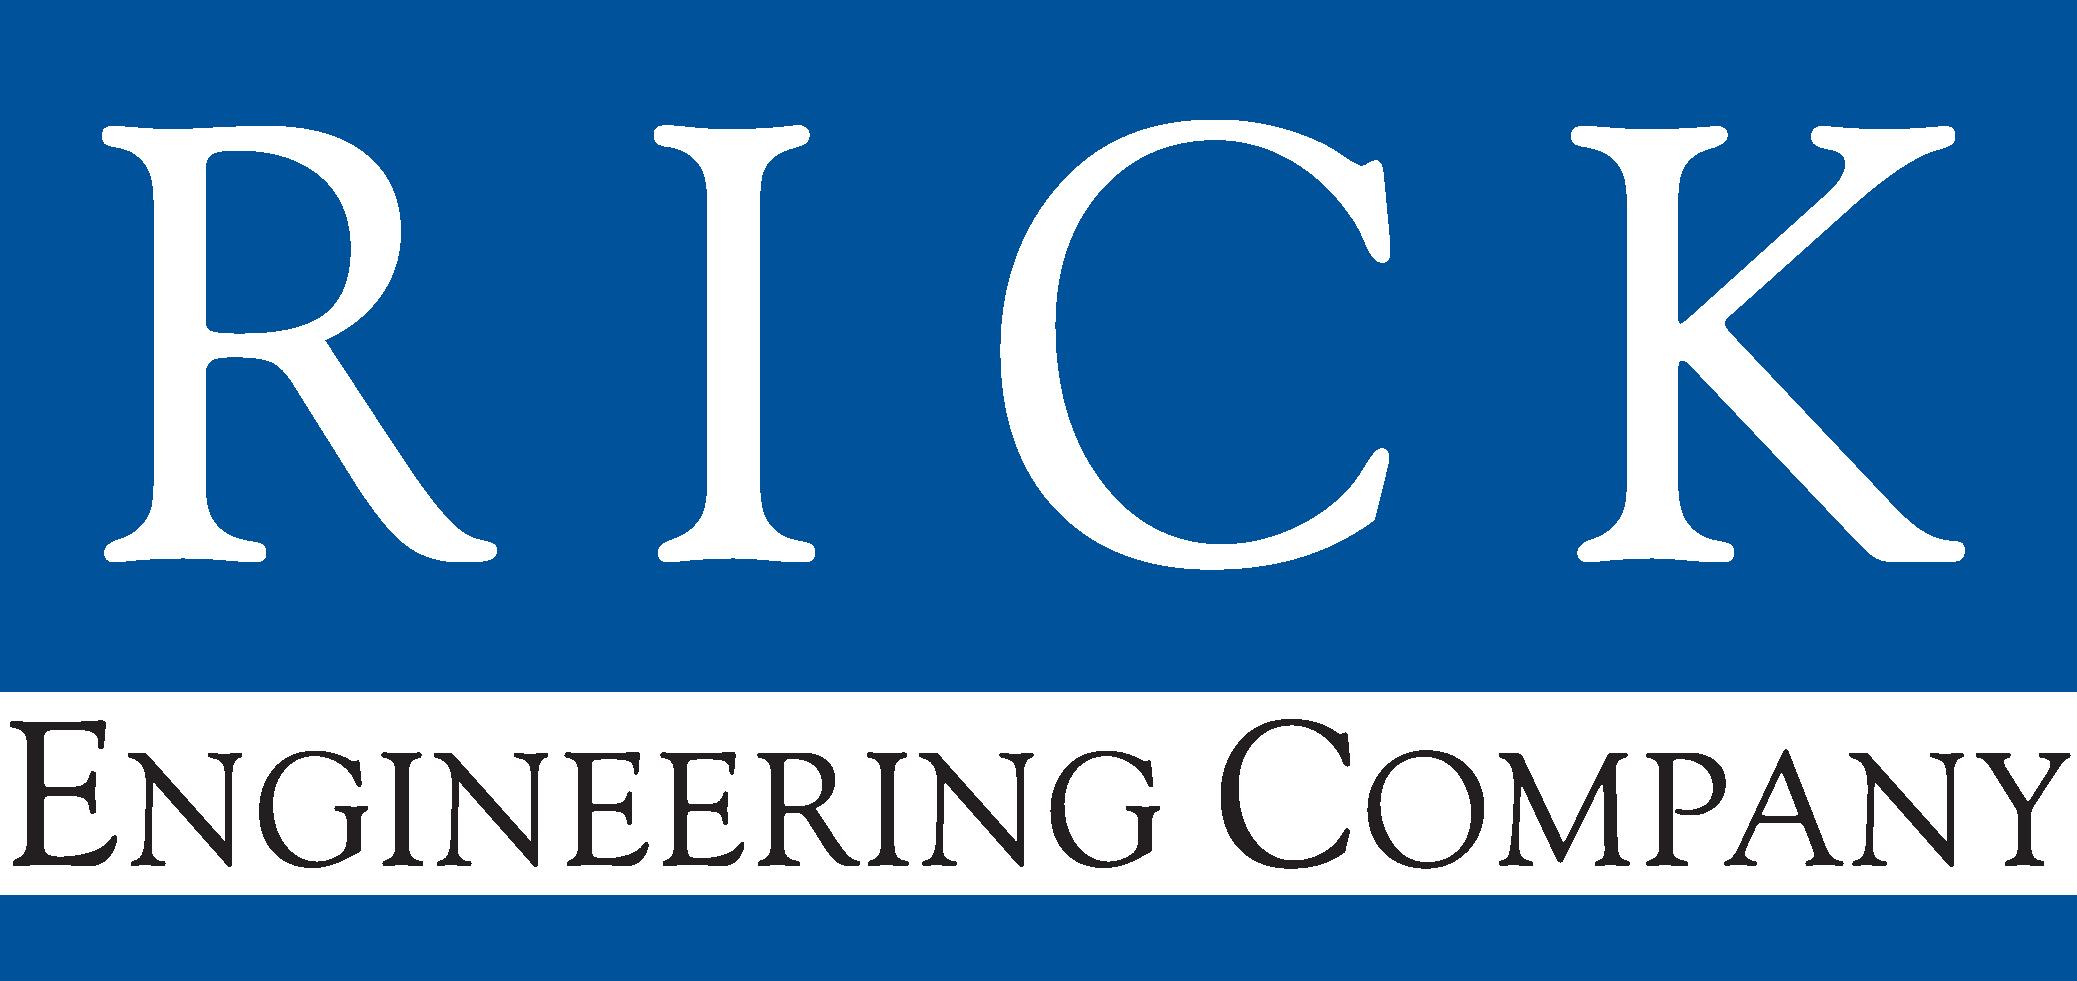 RICK_logo.png